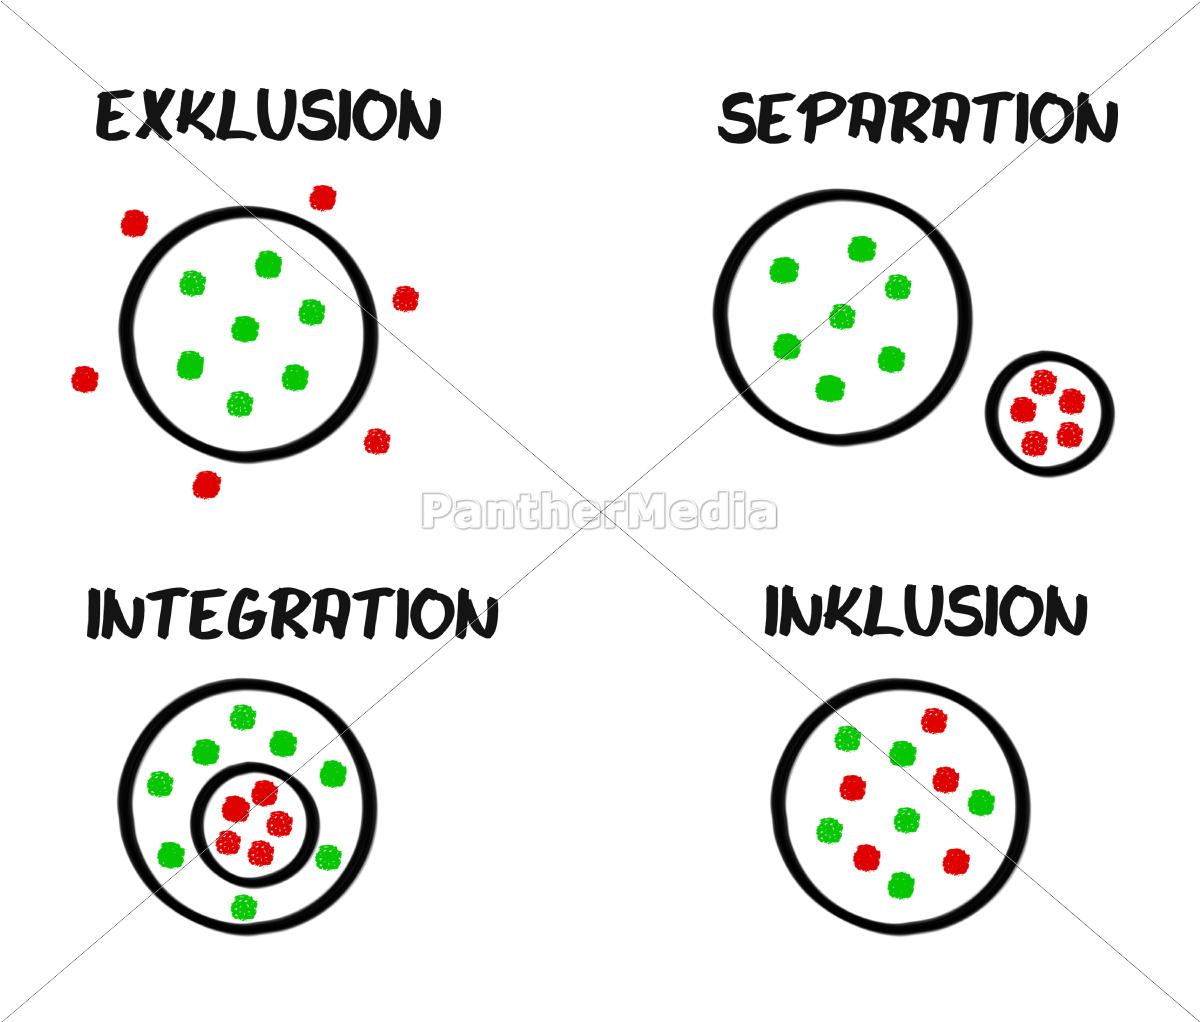 schema, exklusion, separation, integration, inklusion - 9418750